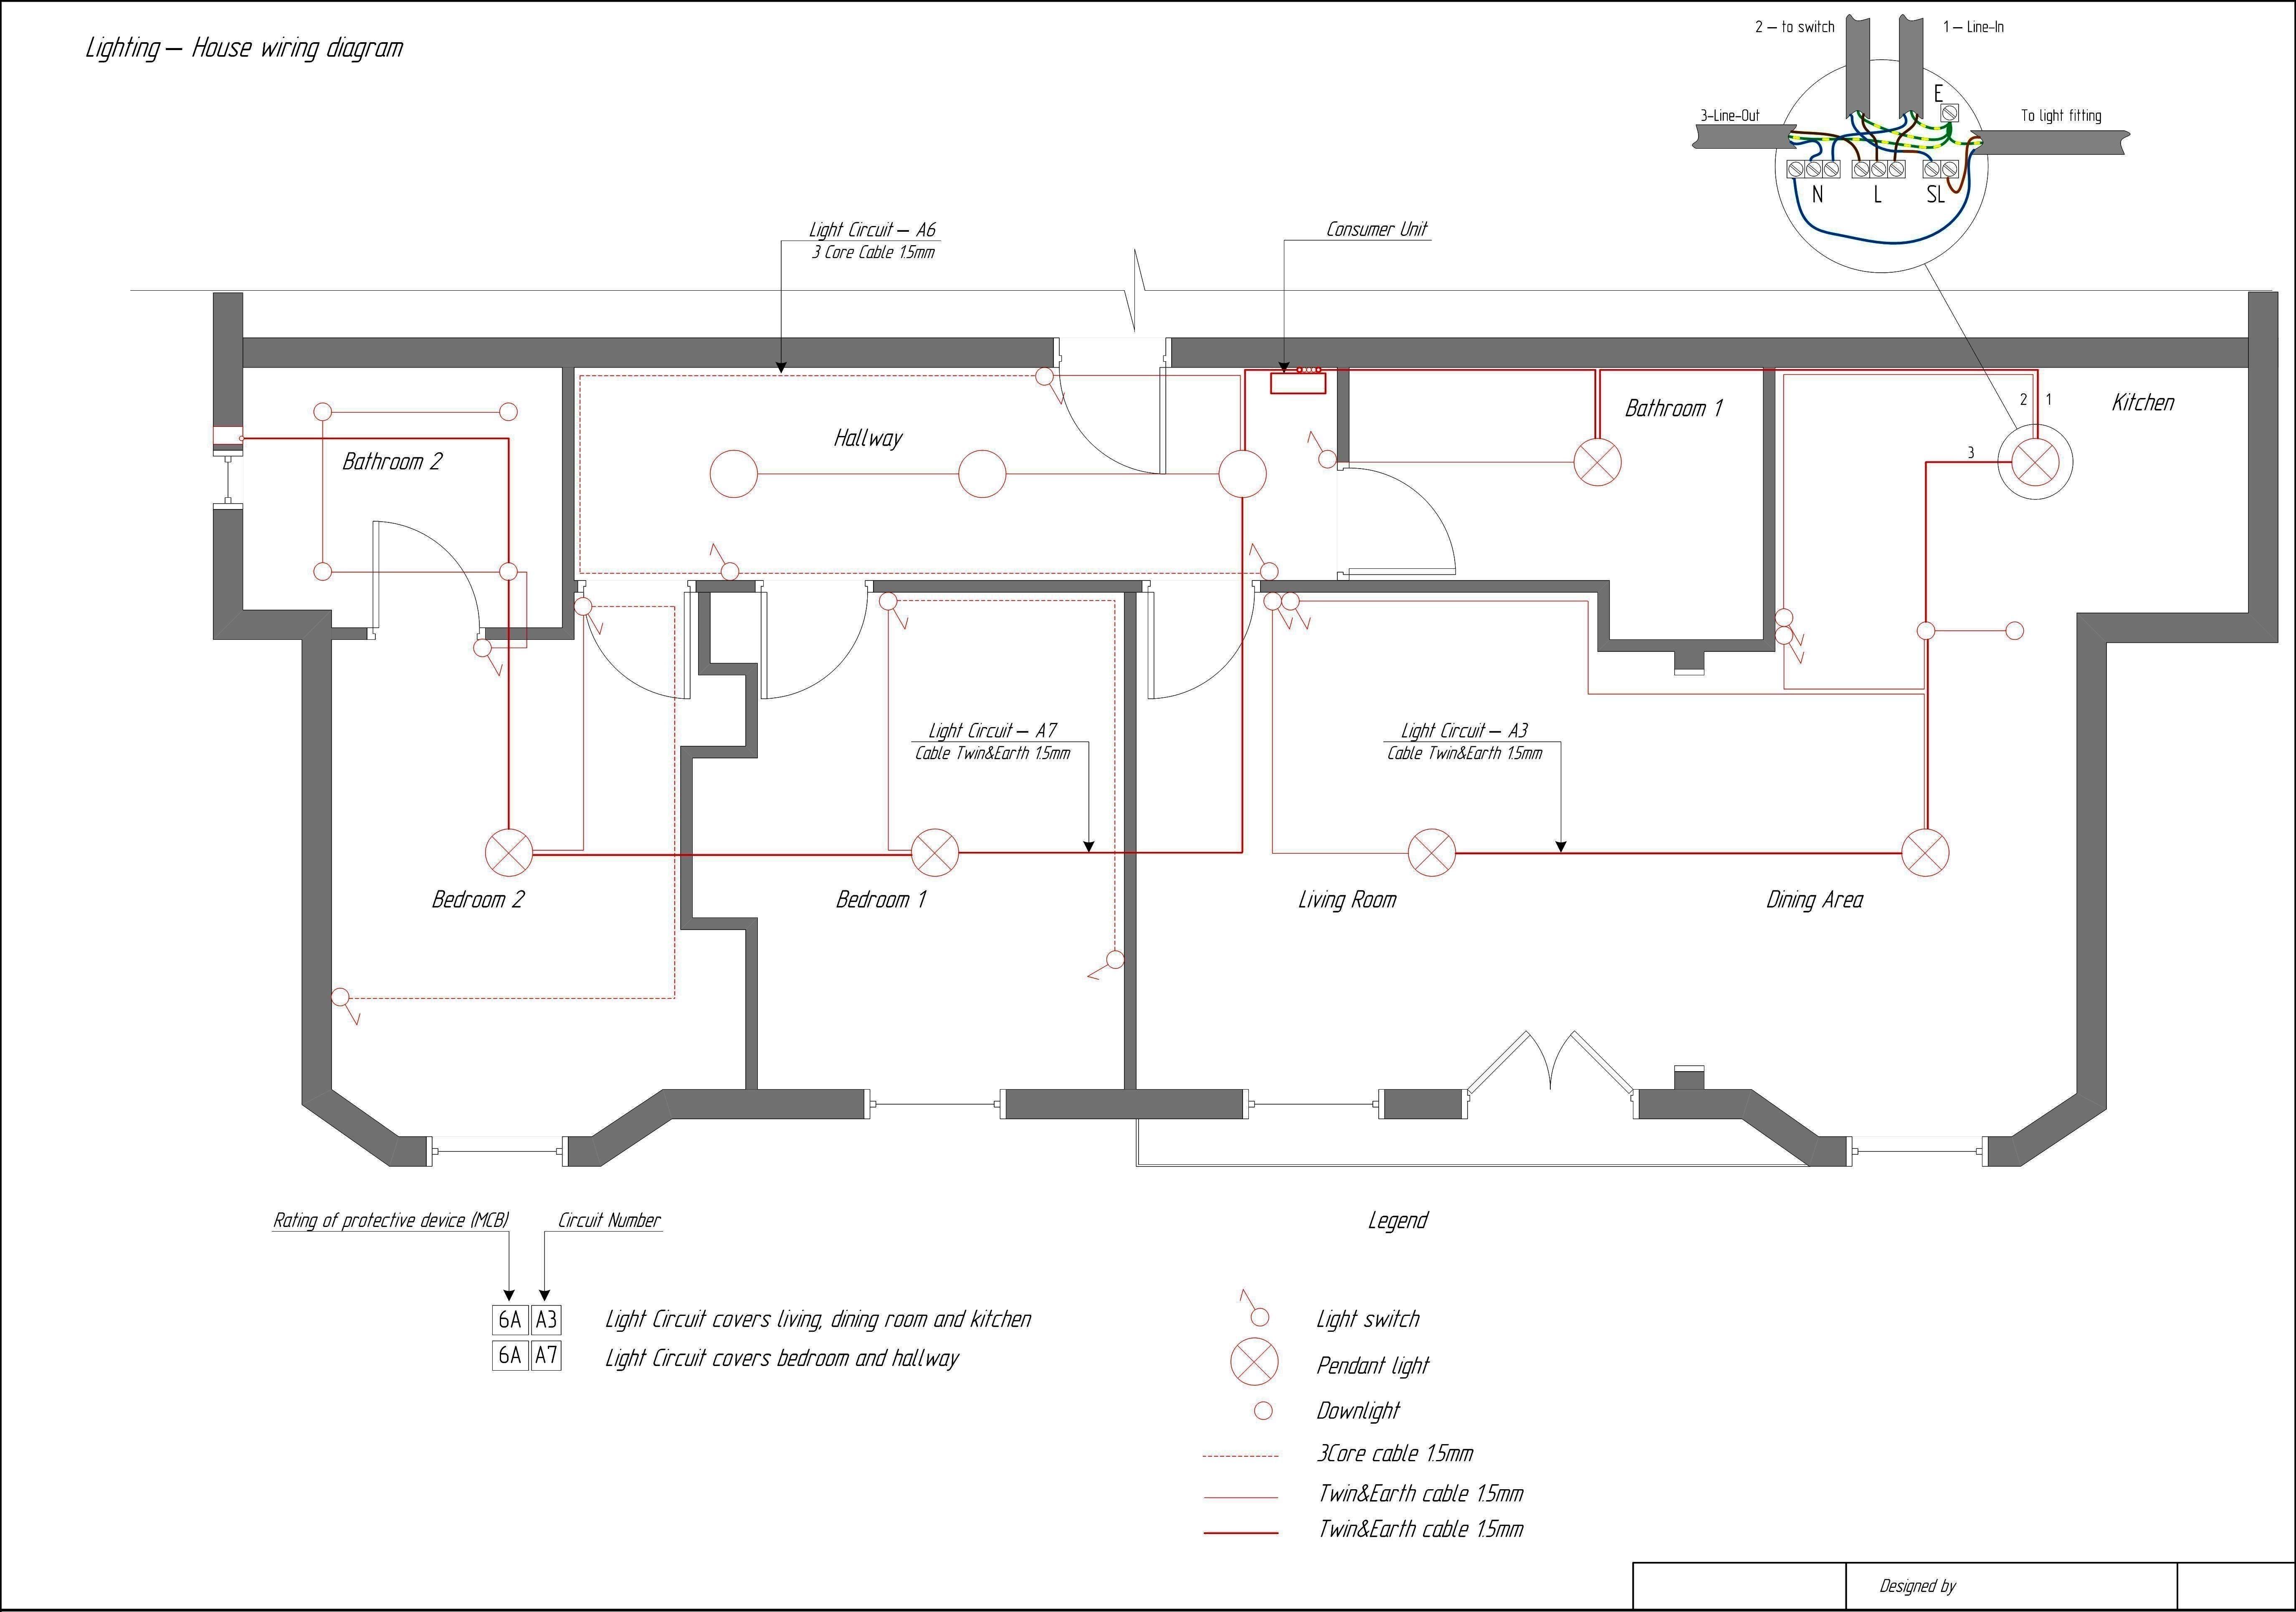 06 mustang wiring diagram unique wiring bathroom fan and light separately diagram diagram  unique wiring bathroom fan and light